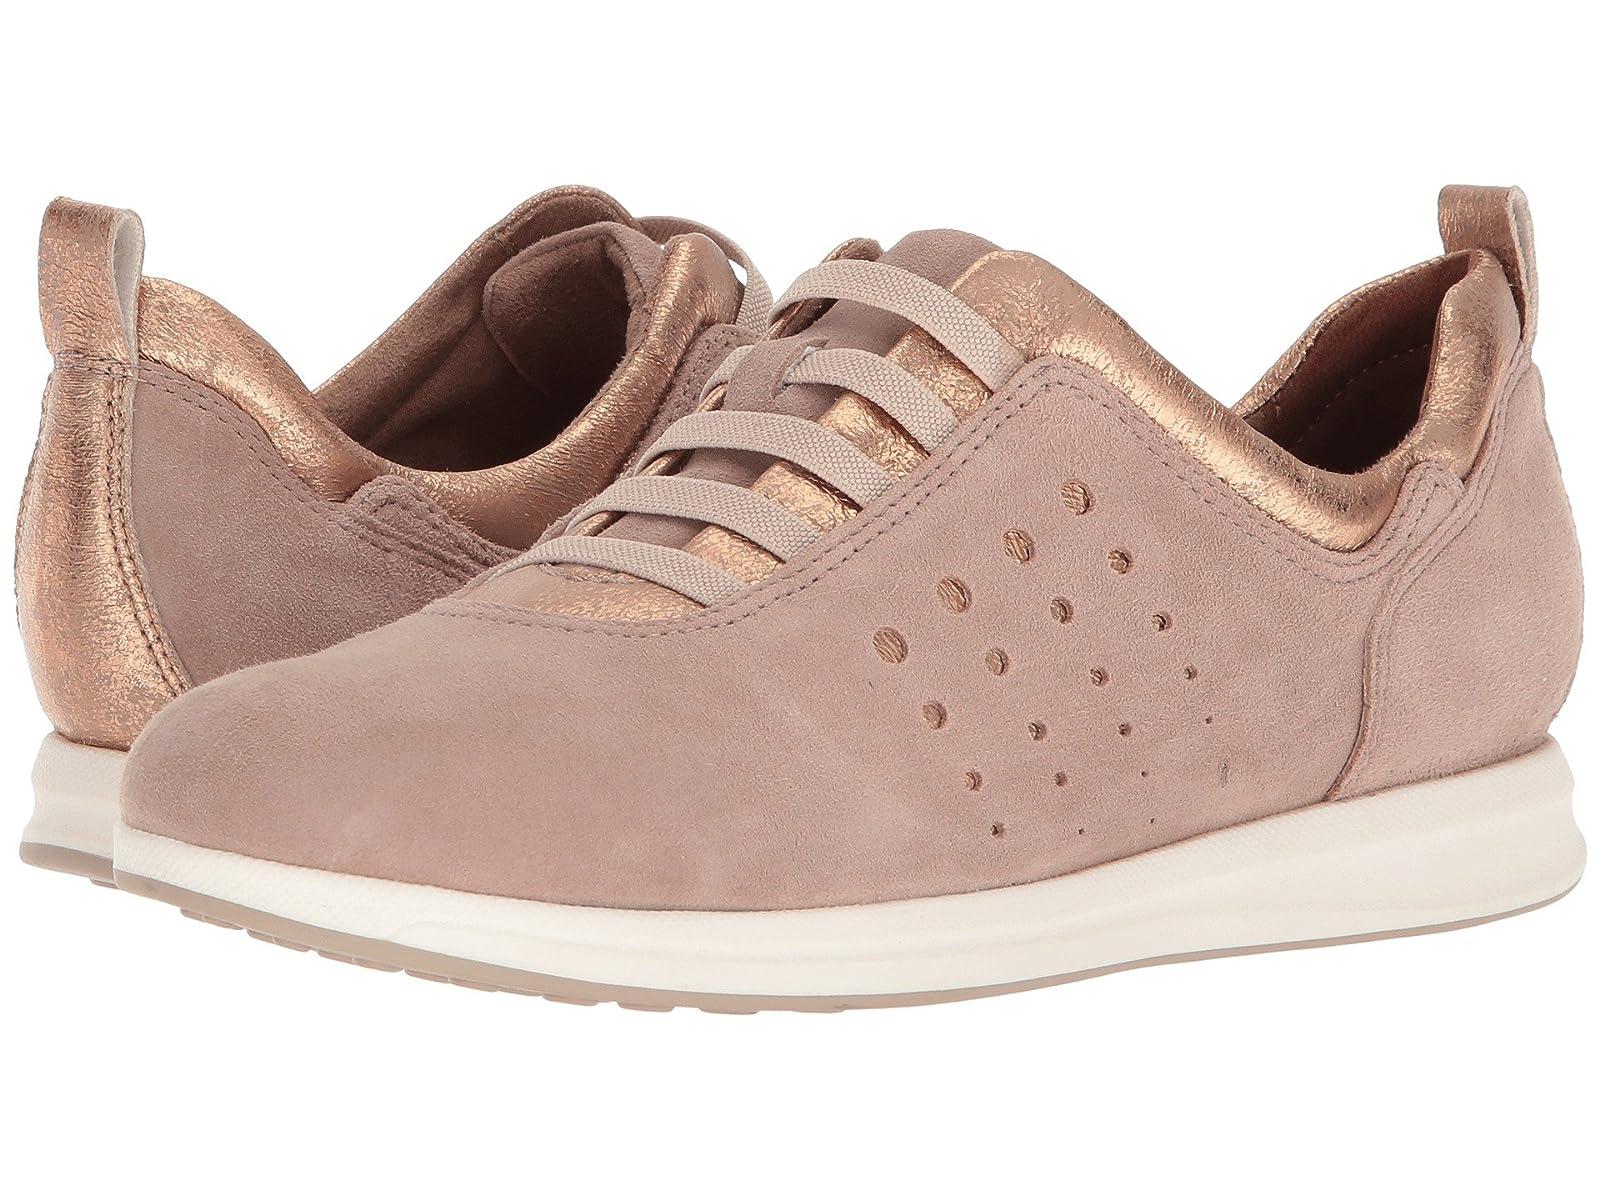 Tamaris Gini 1-1-24629-20Cheap and distinctive eye-catching shoes